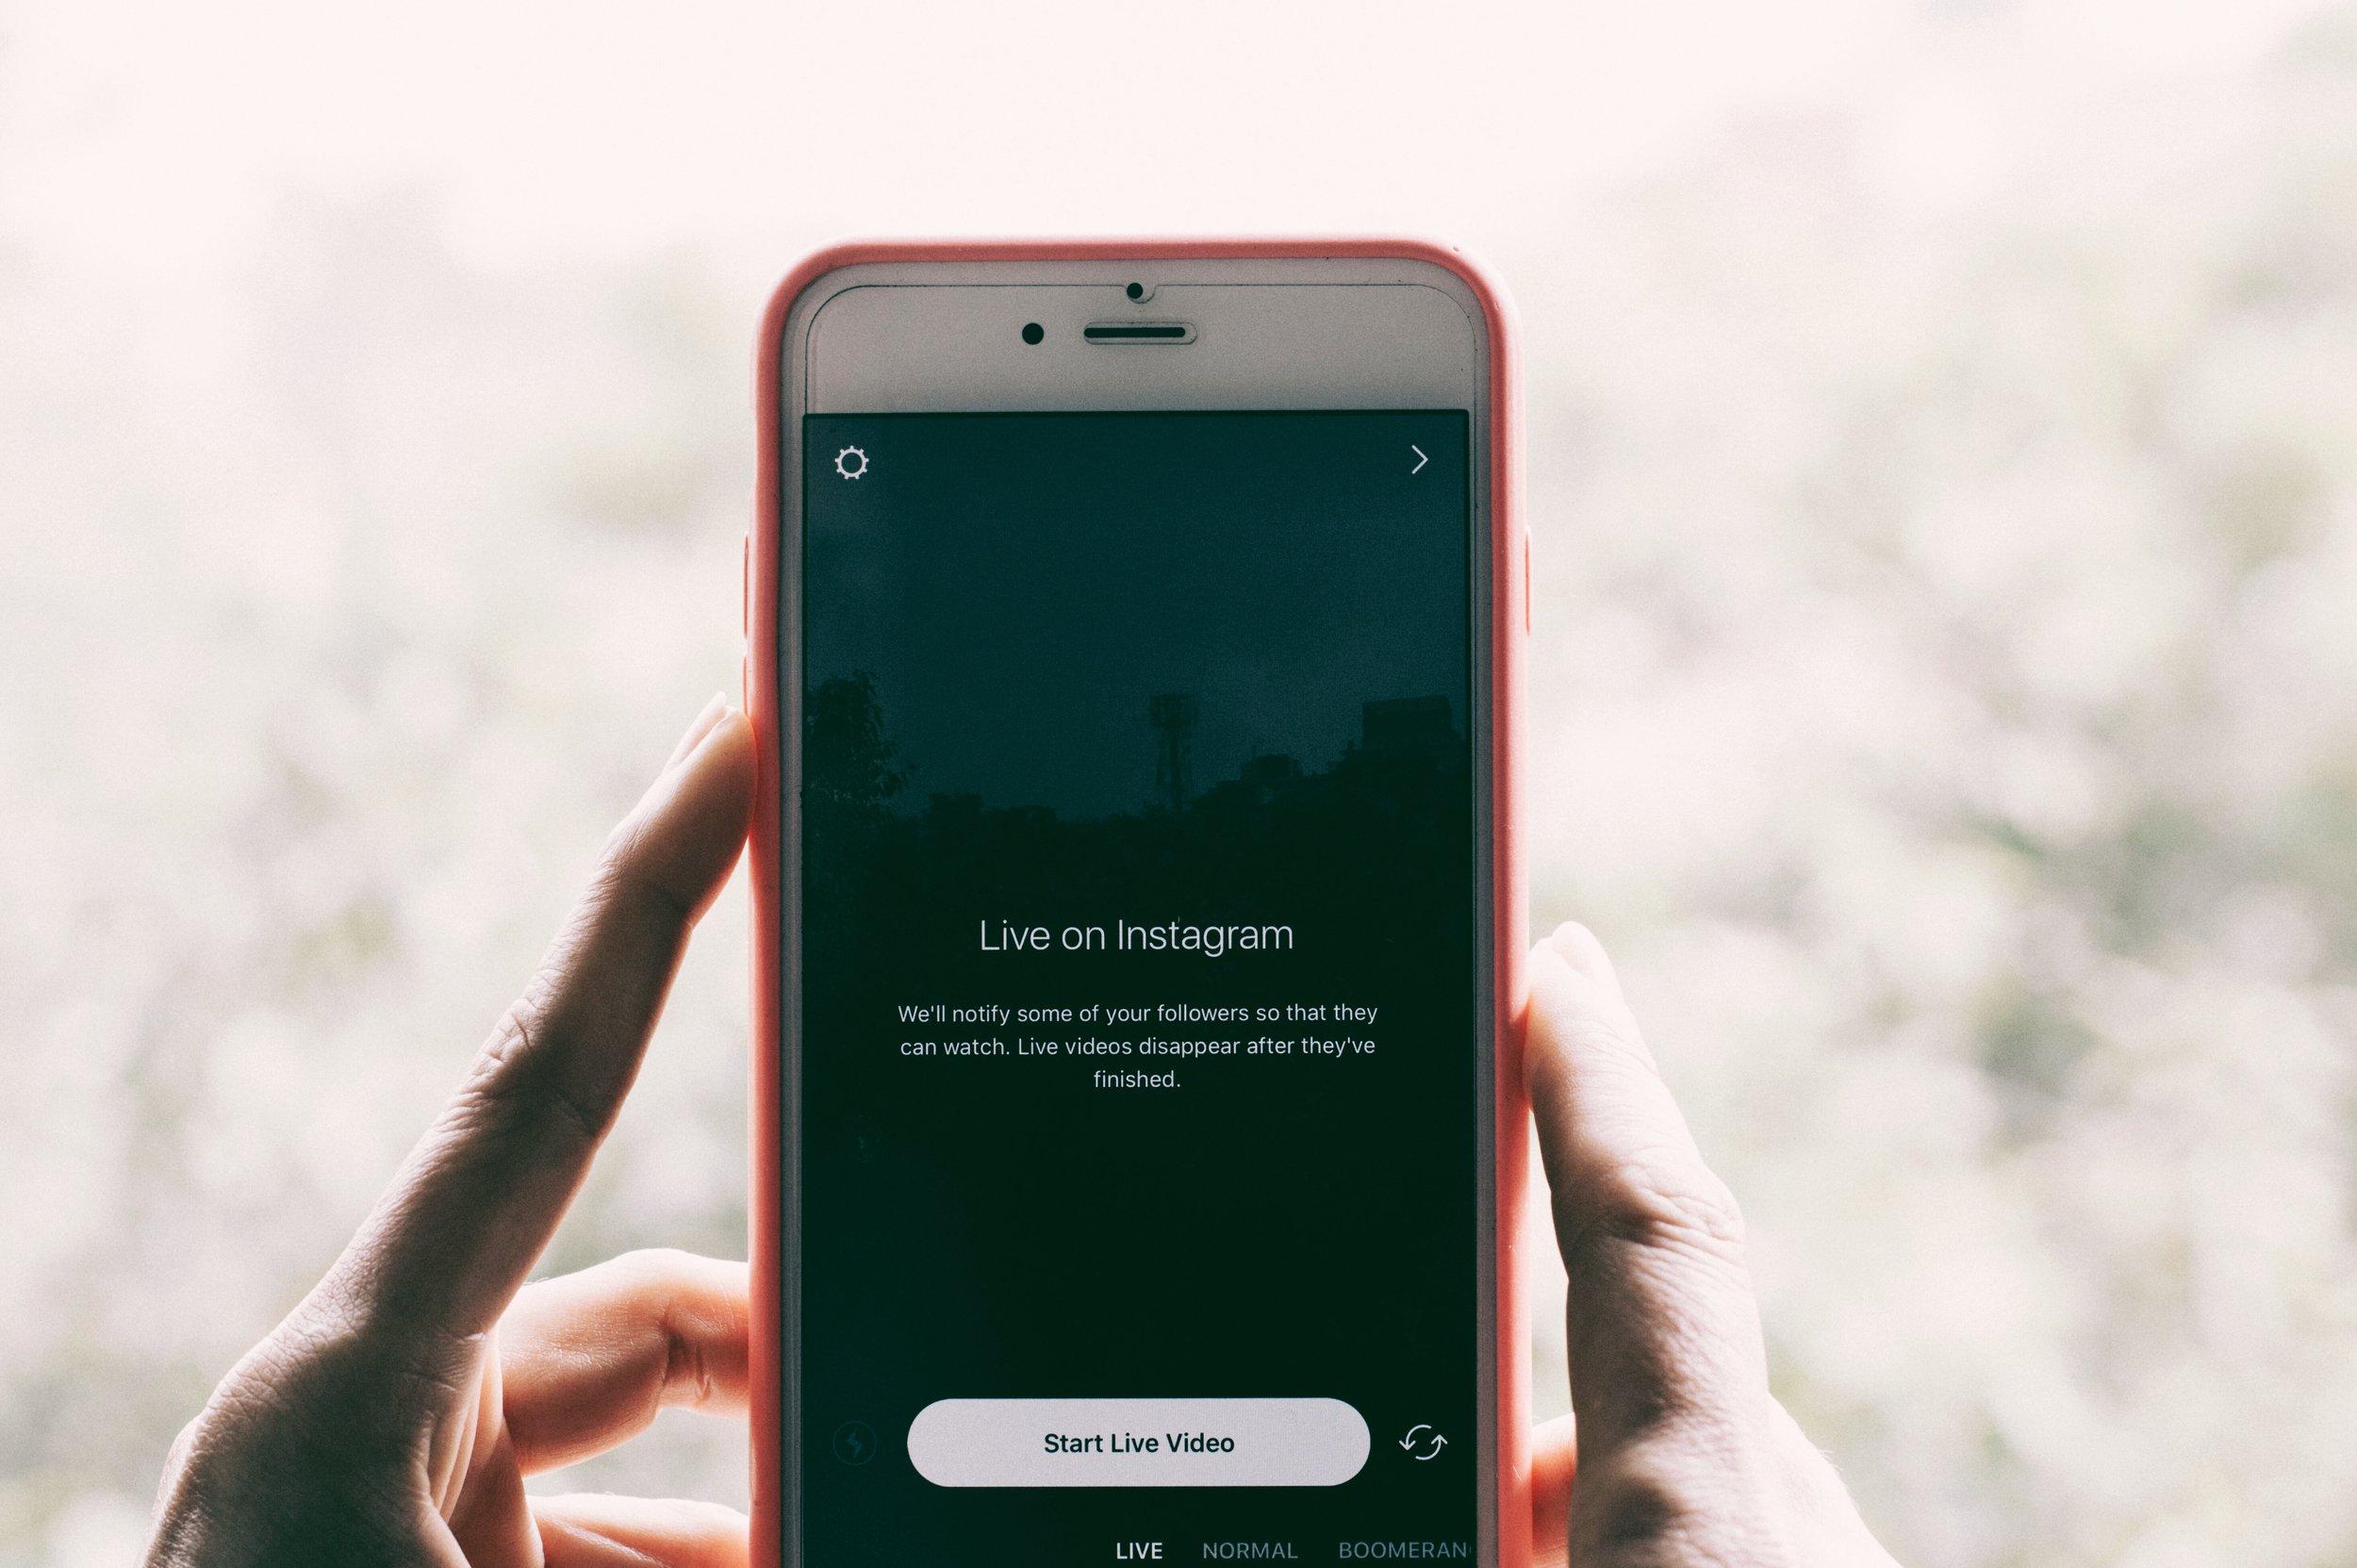 Social Media - Soulful, Mindful Use